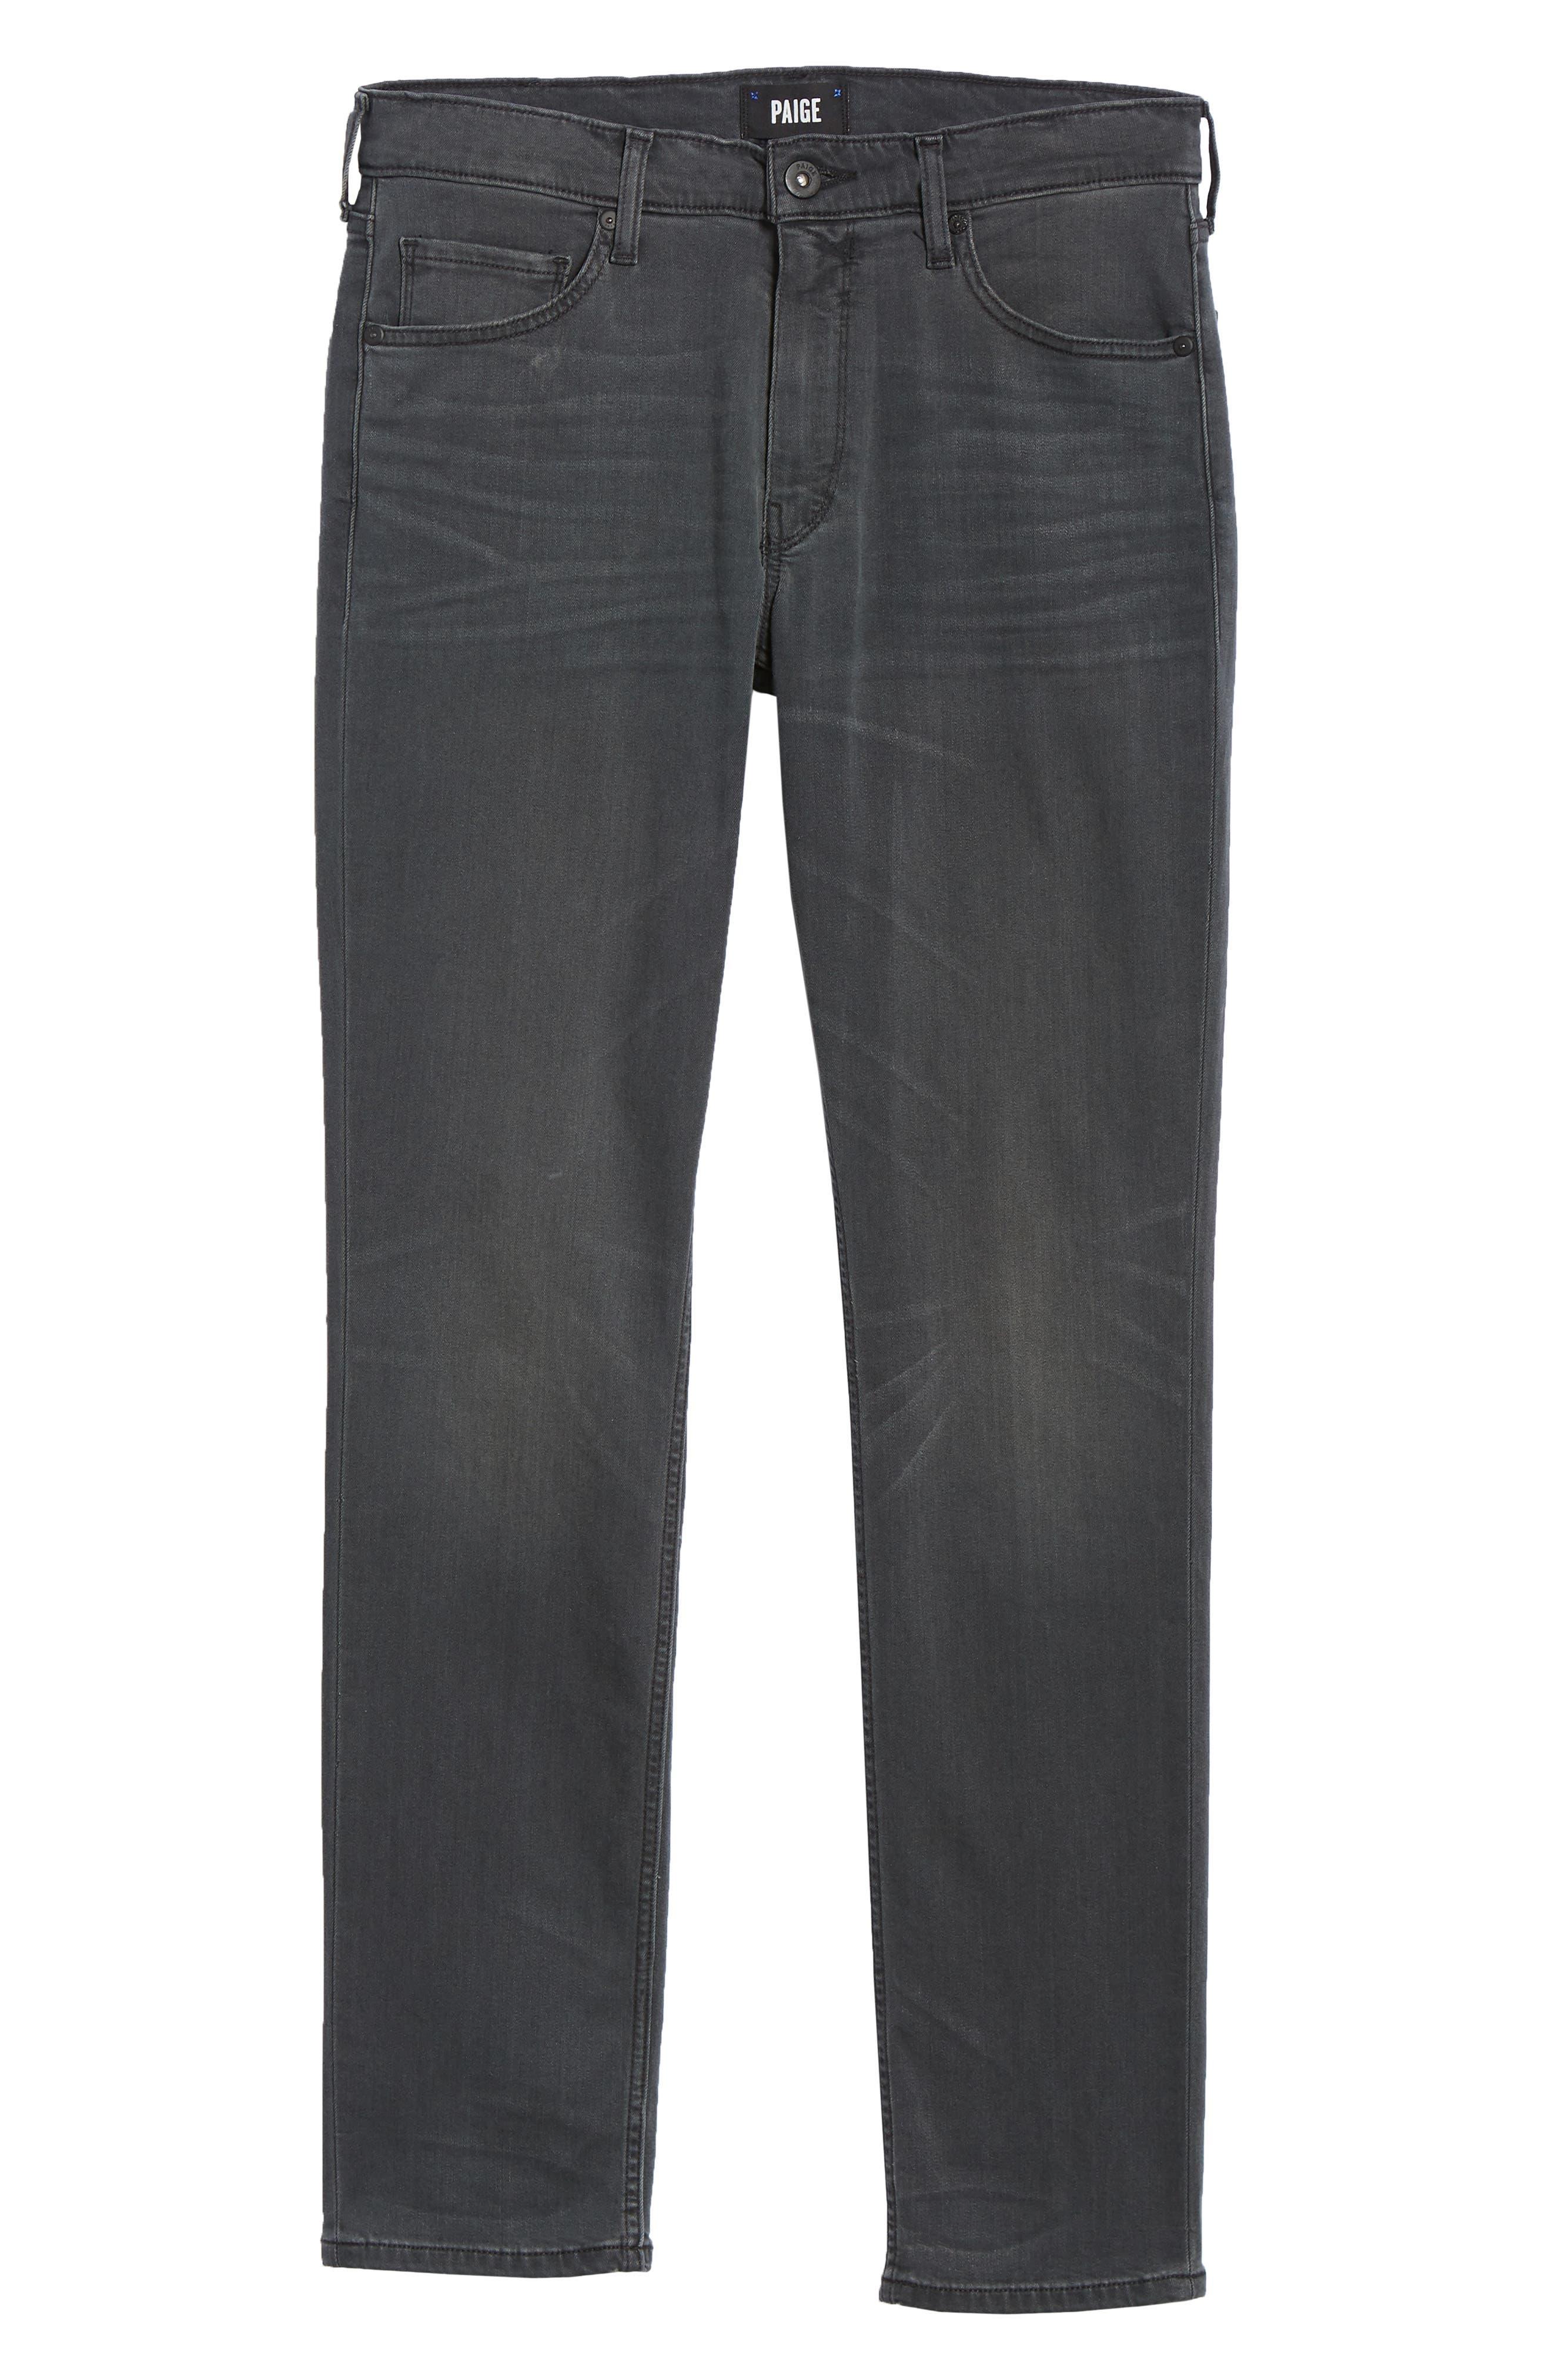 Transcend - Lennox Slim Fit Jeans,                             Alternate thumbnail 6, color,                             SHELDON